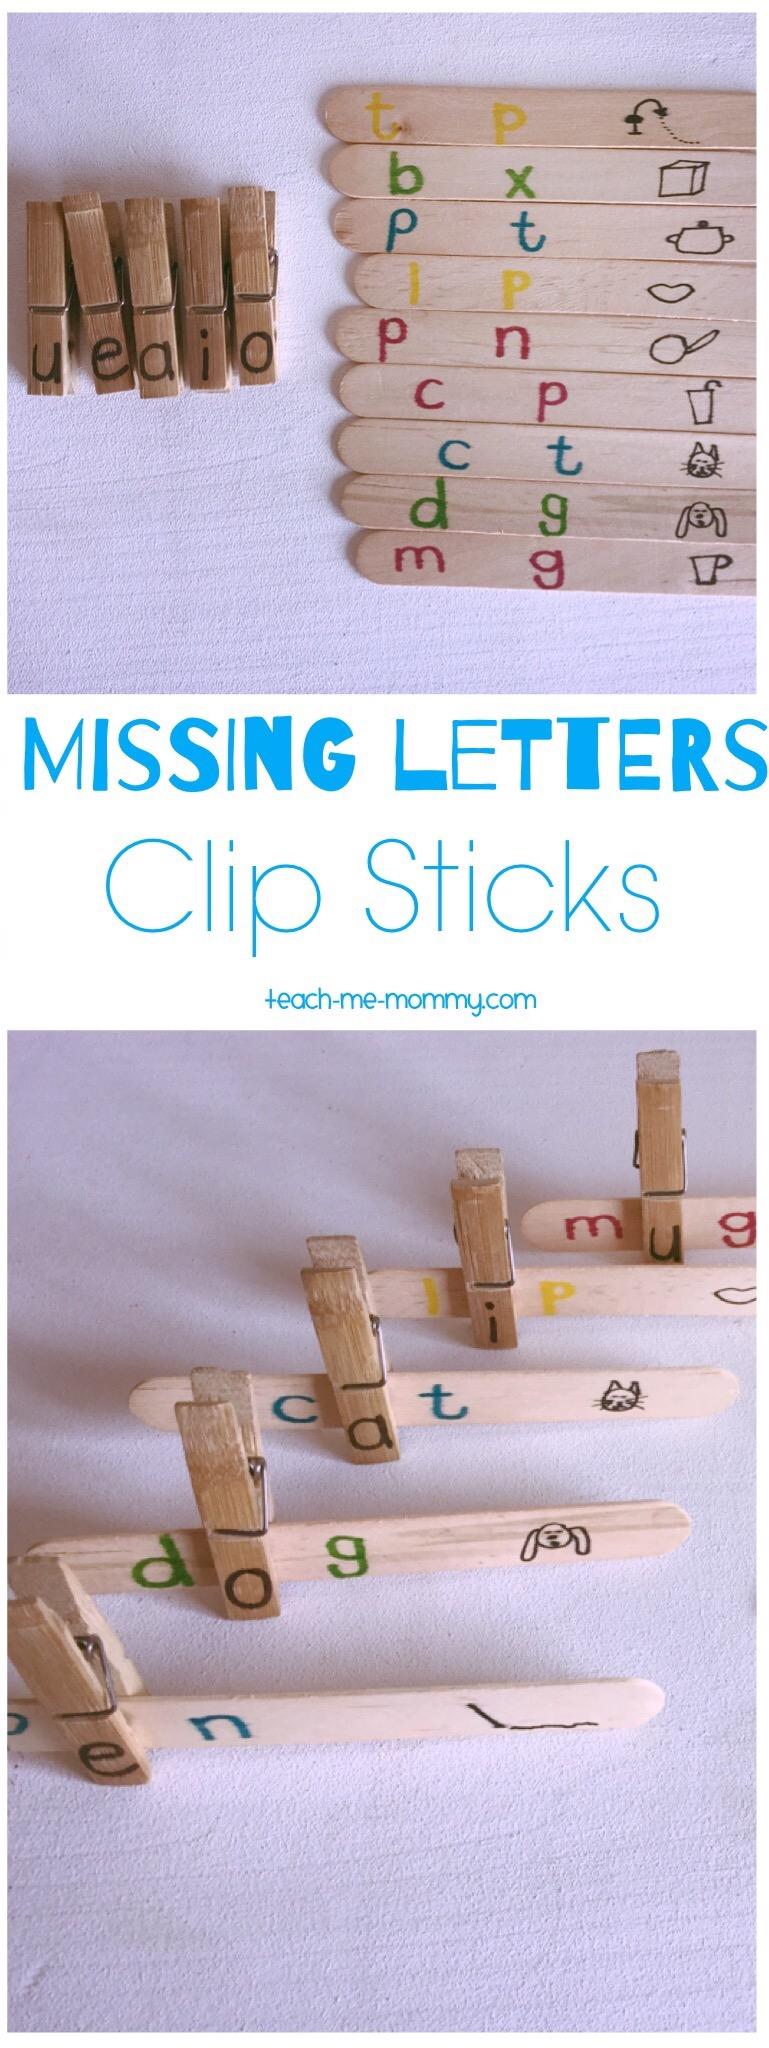 Missing letter clip sticks